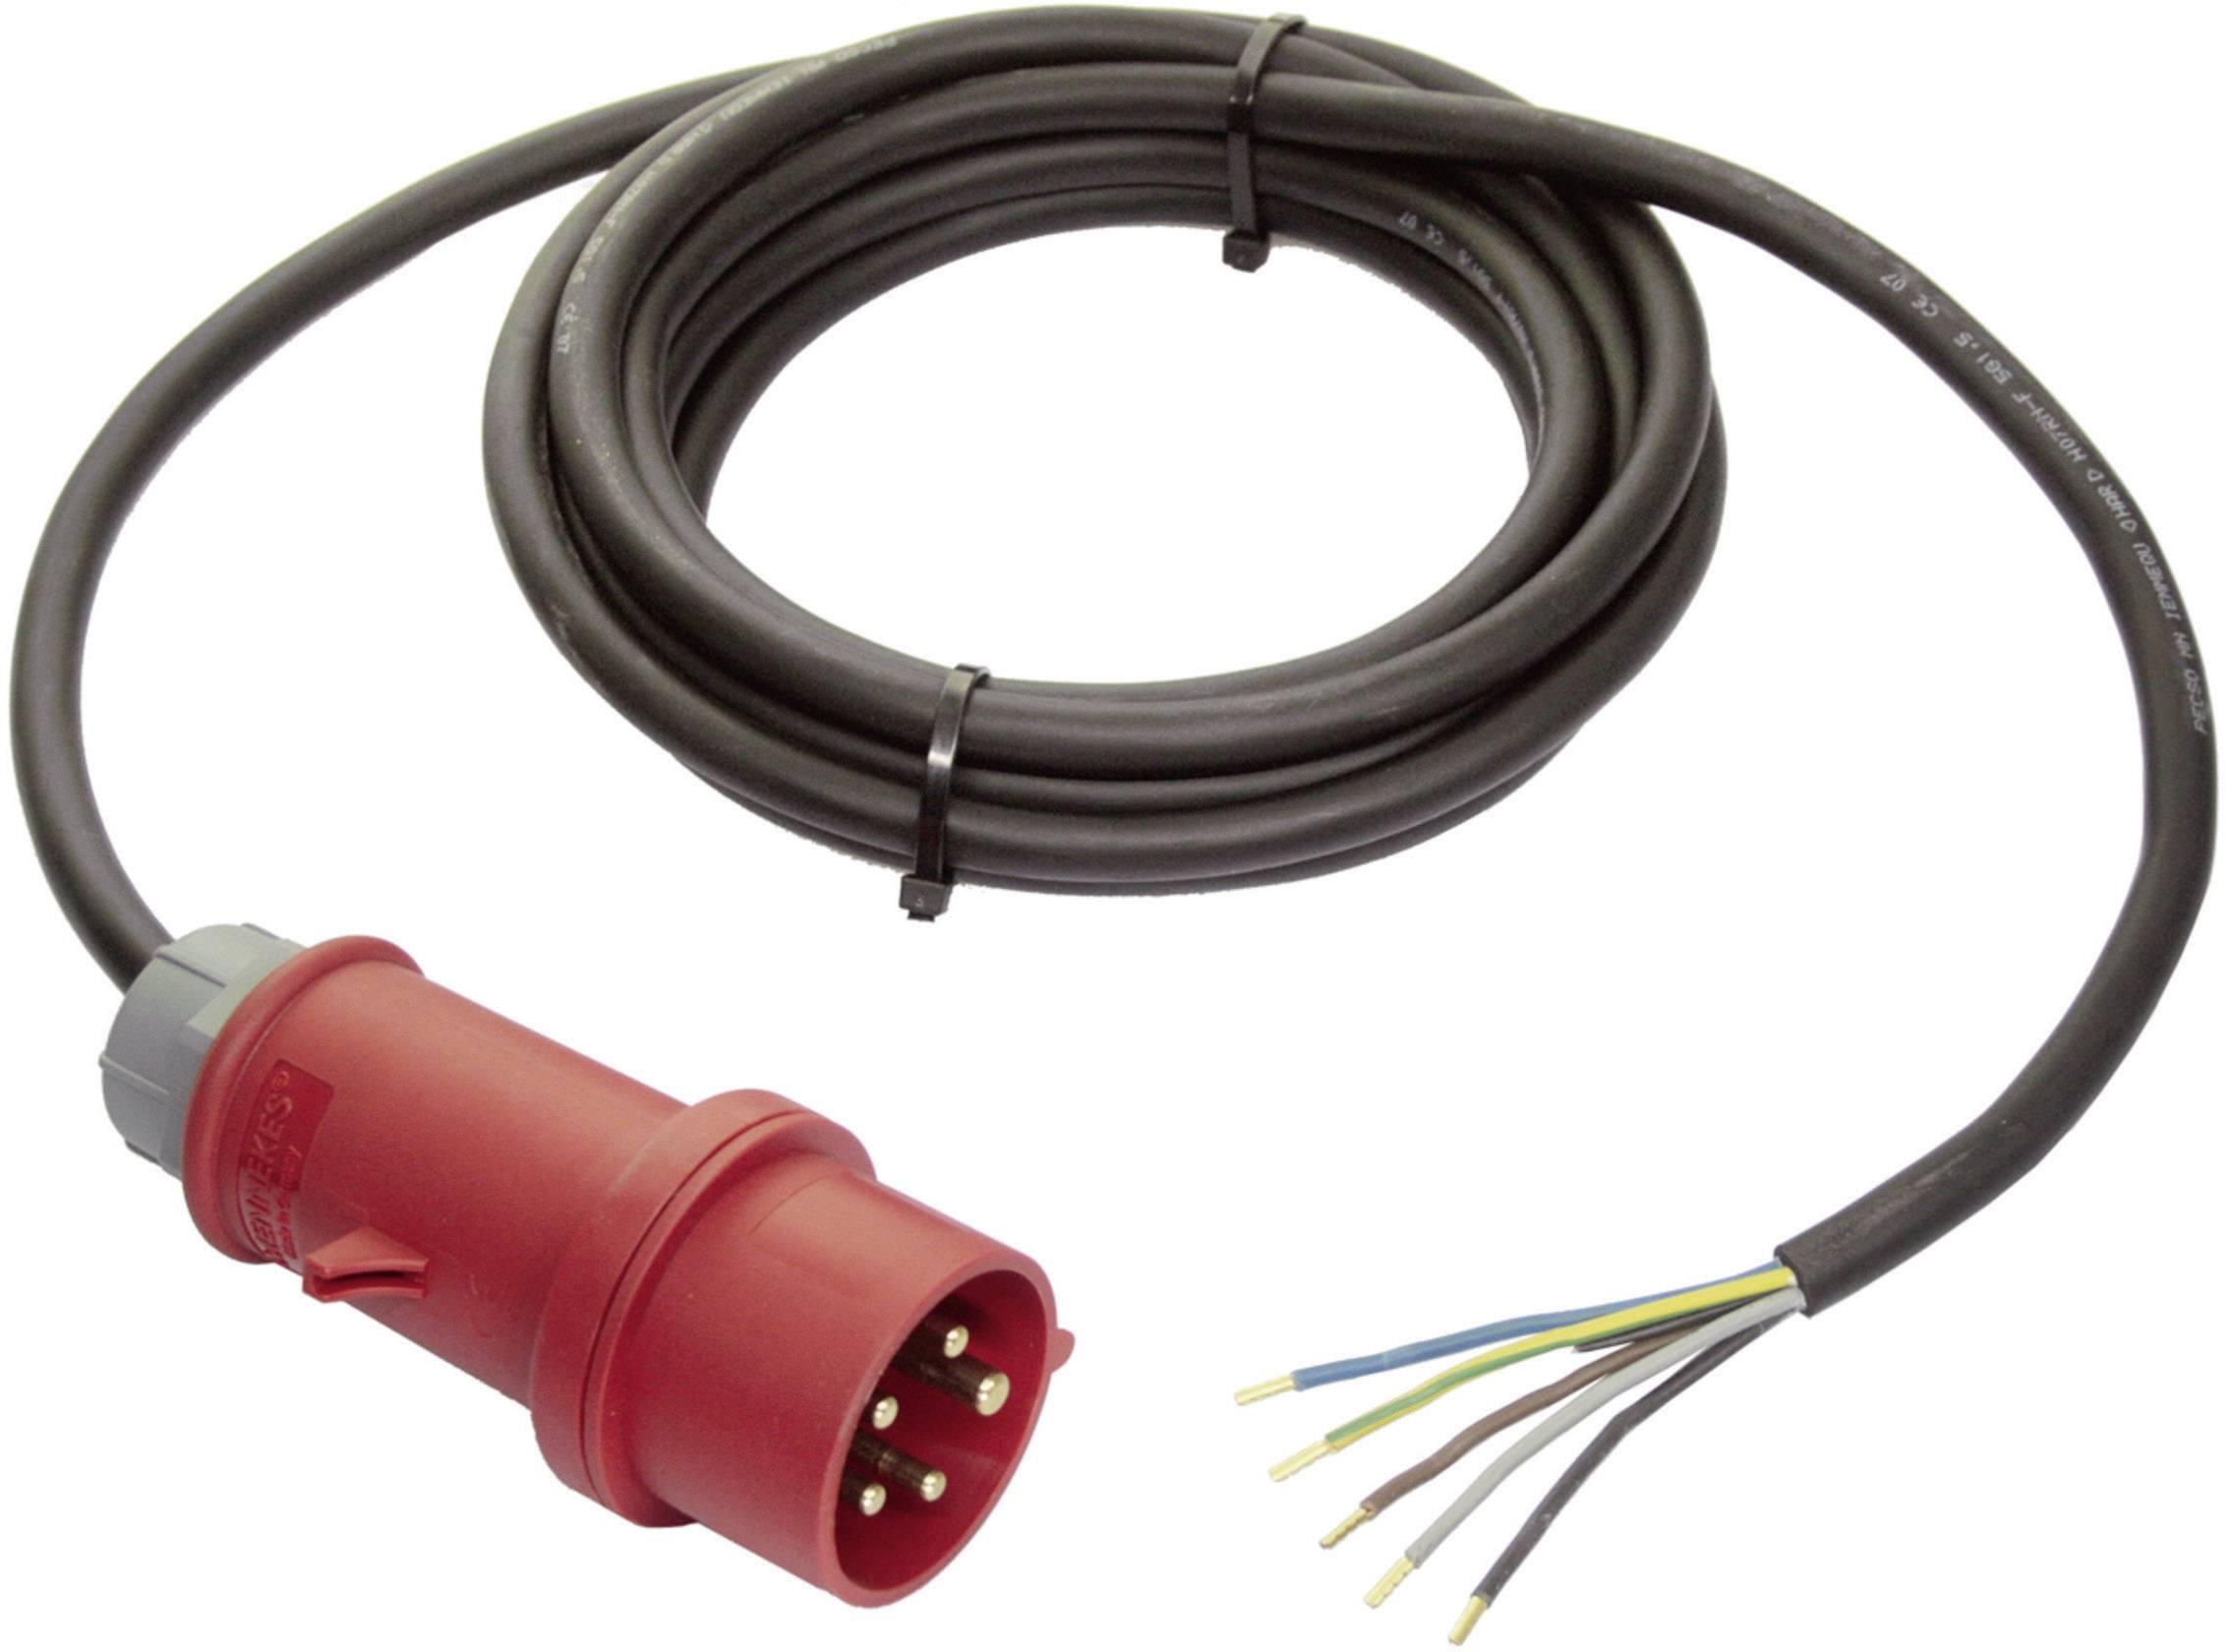 Síťový kabel AS Schwabe 7097, CEE zástrčka/otevřený konec, 2,5 mm², 5 m, černá